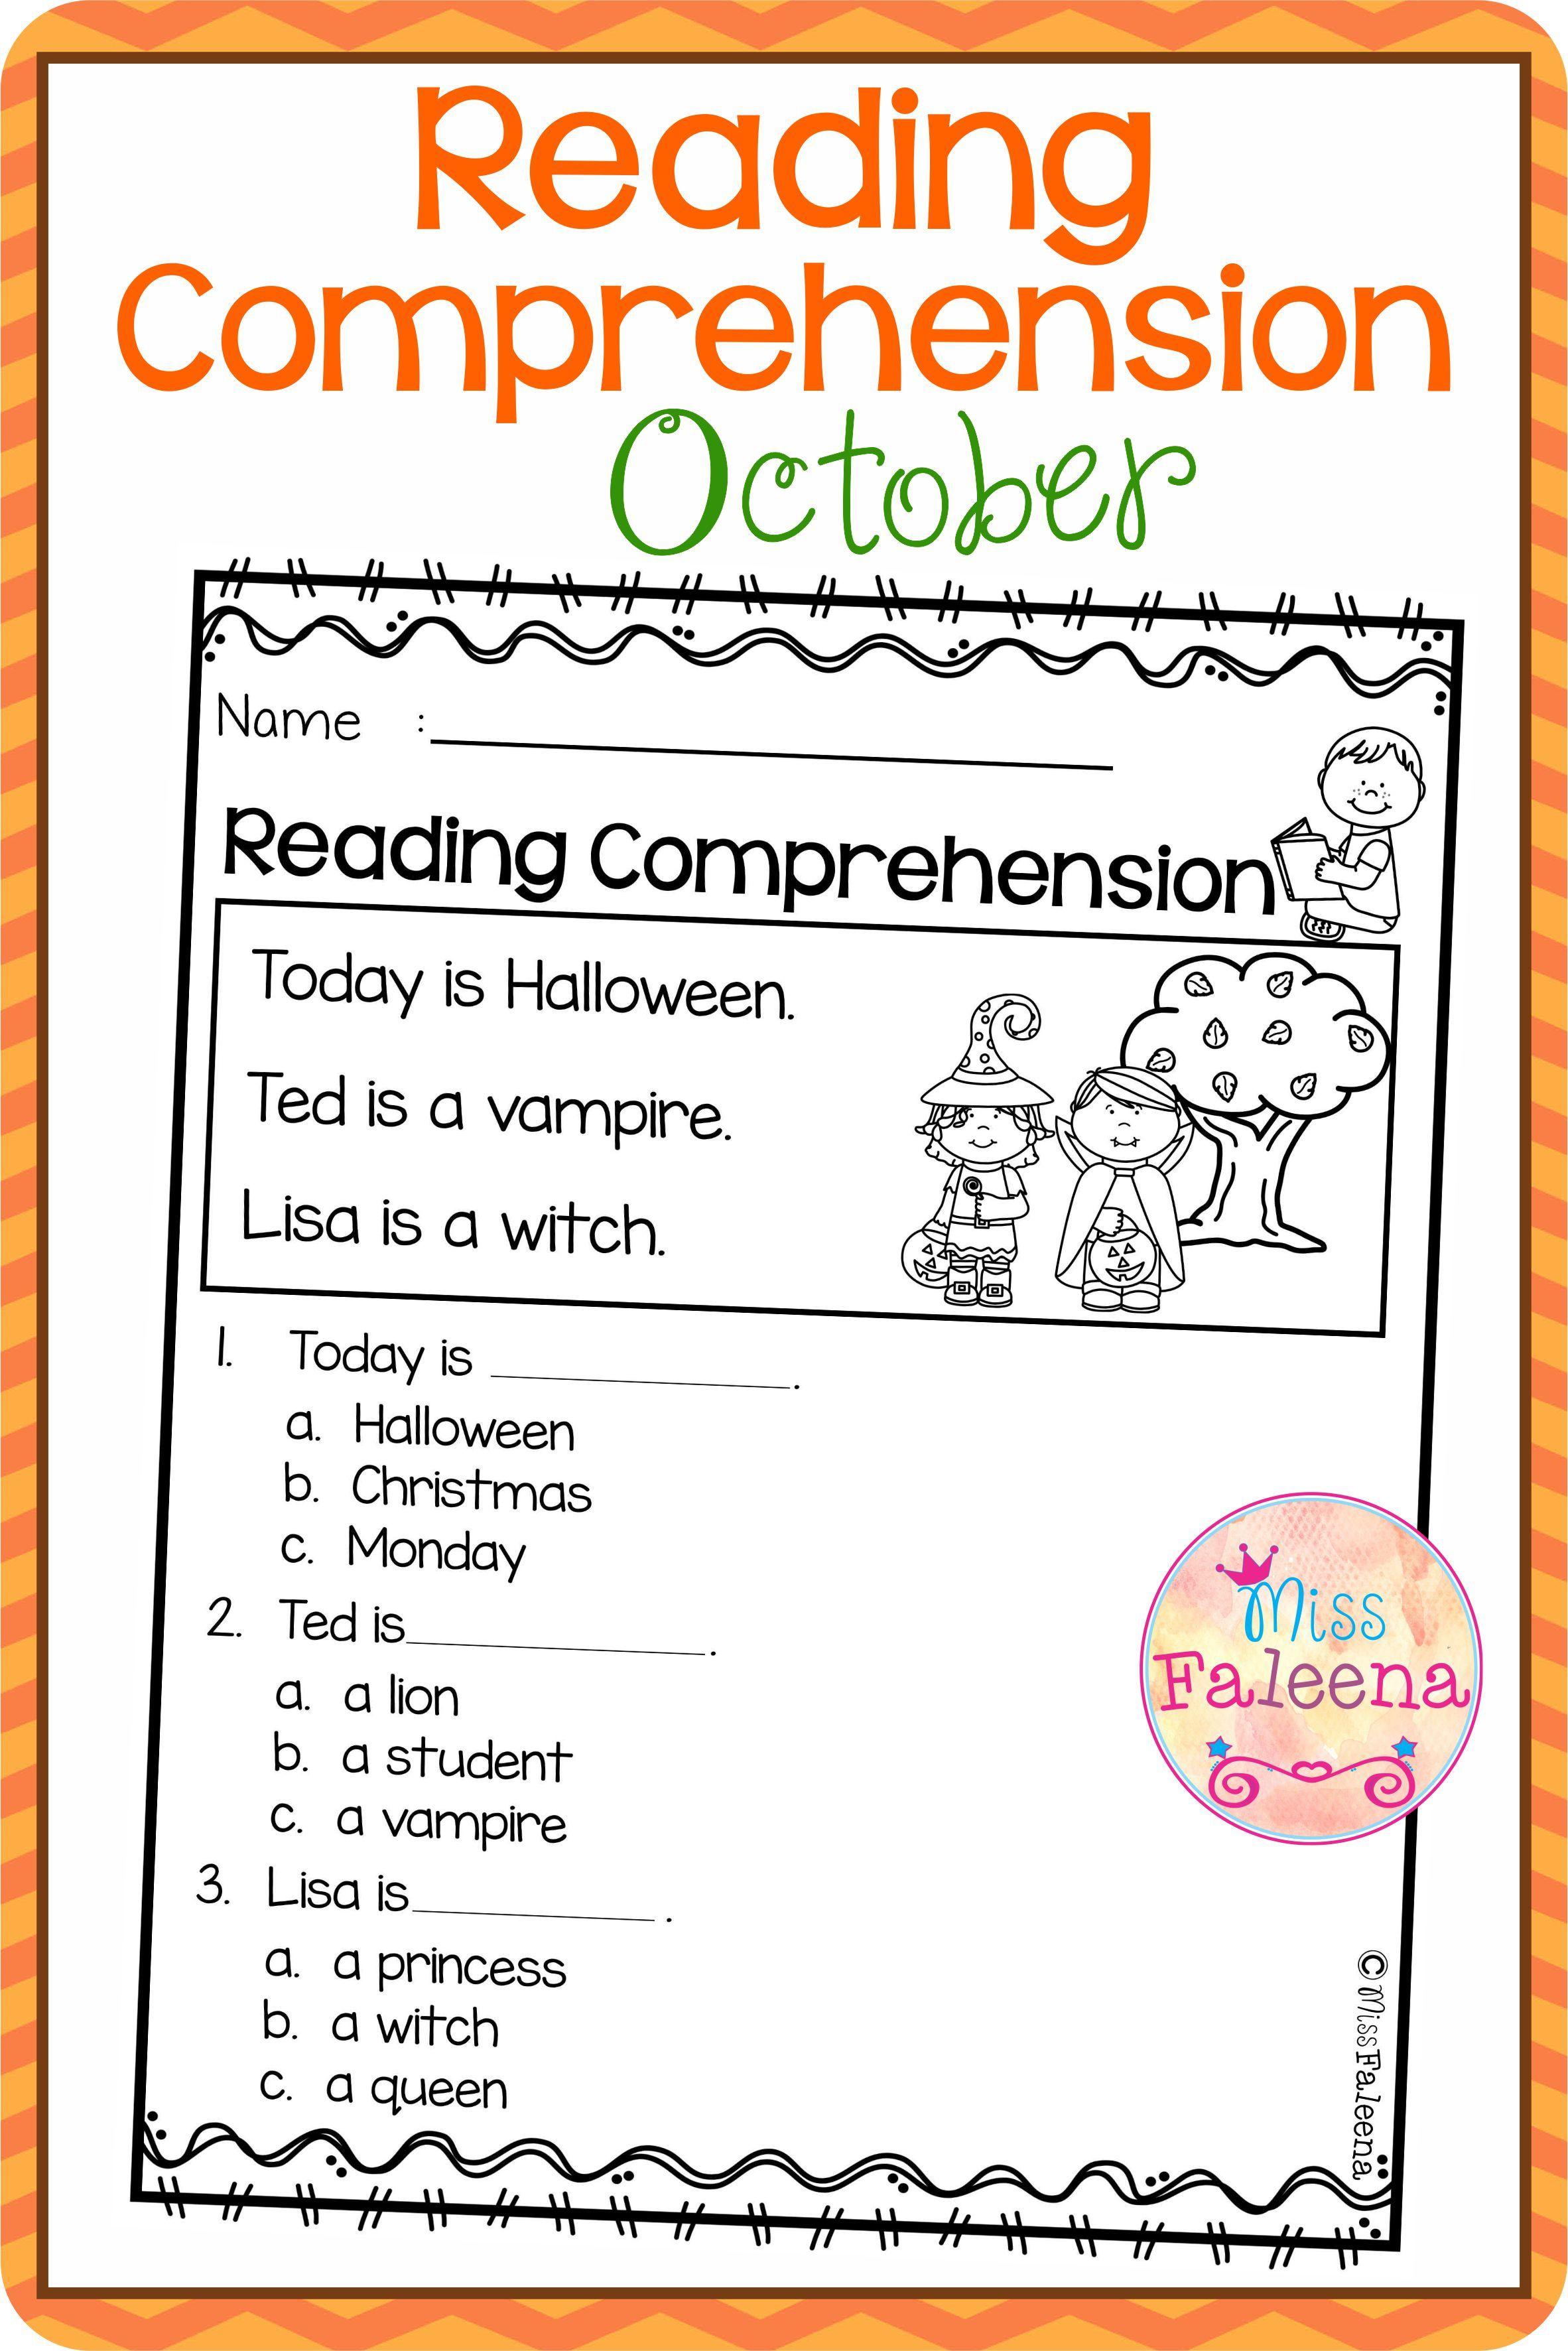 October Reading Comprehension Reading Comprehension October Reading Reading Comprehension Worksheets [ 3544 x 2364 Pixel ]